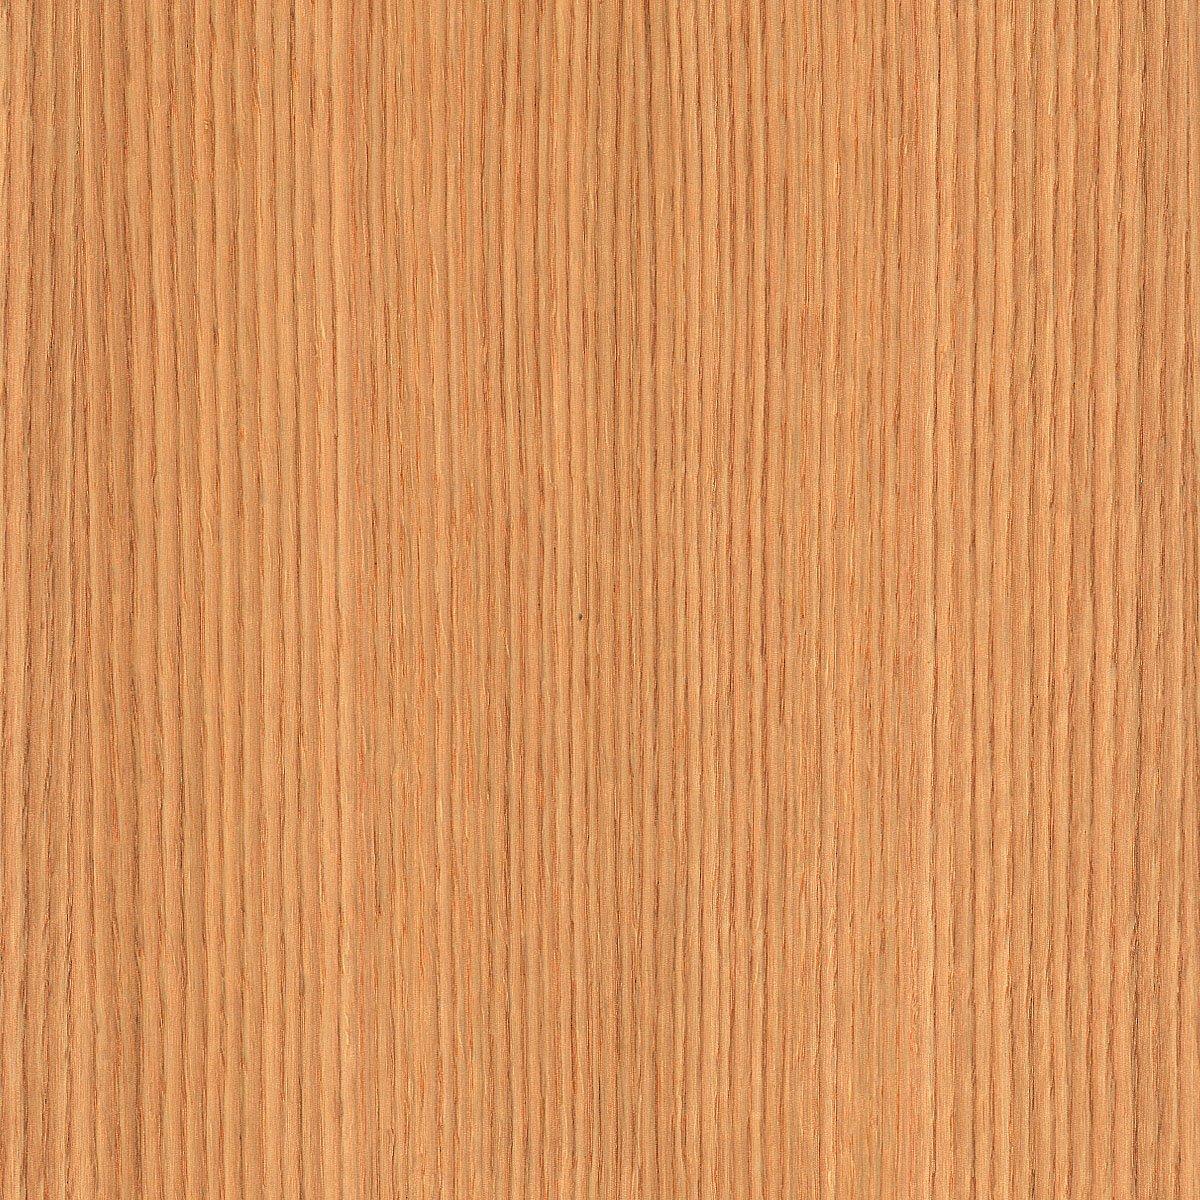 Red Oak Wood Veneer Rift Cut 4x8 20 mil Sheet